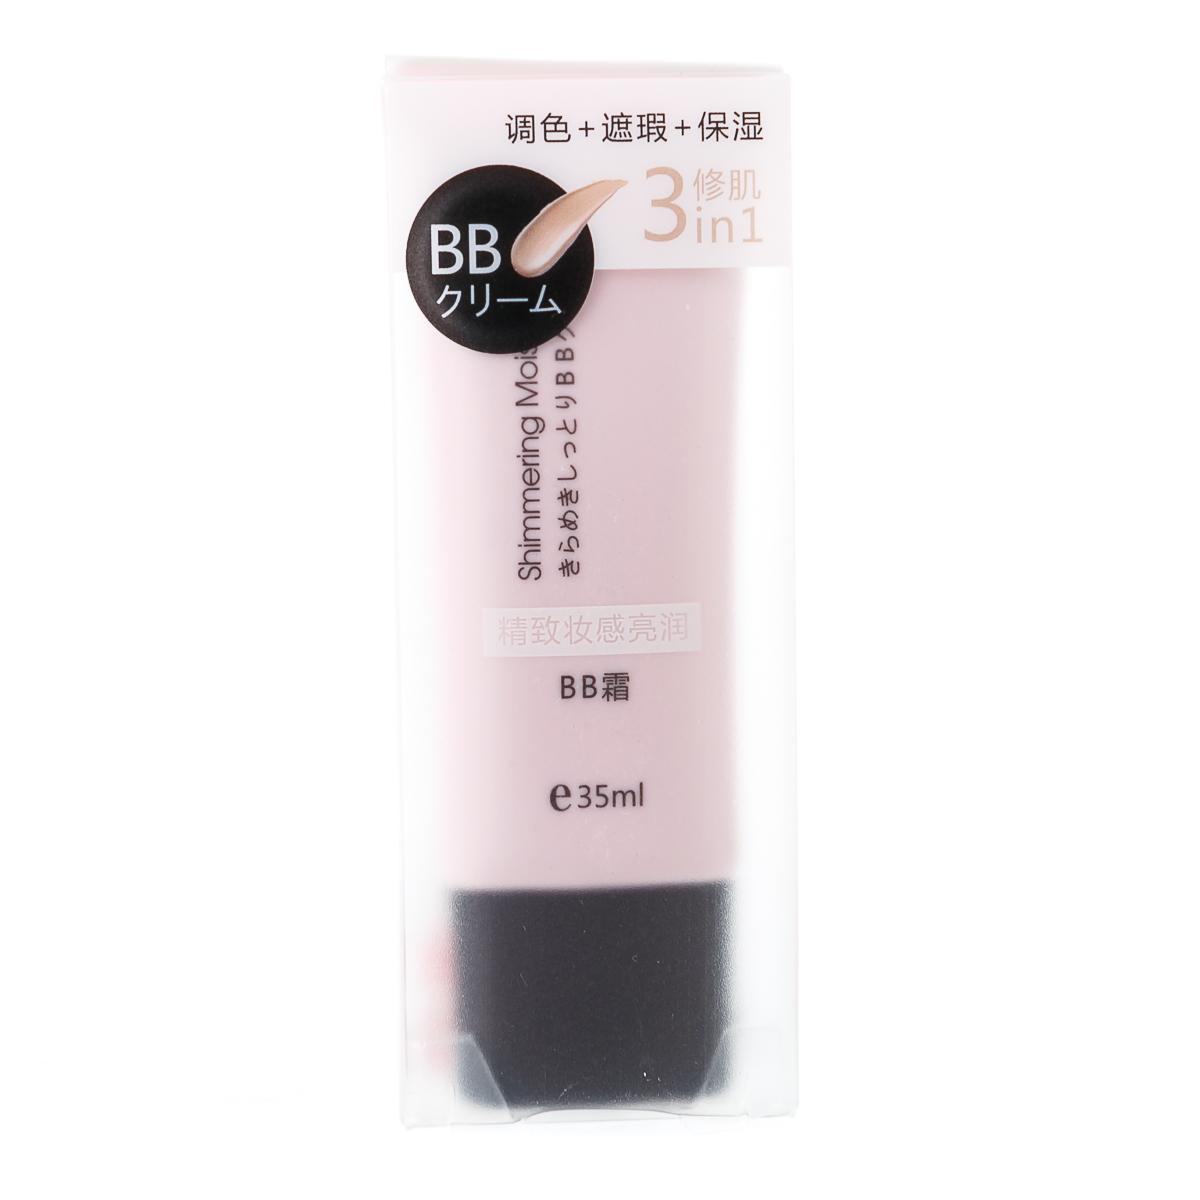 BB-крем на водной текстуре